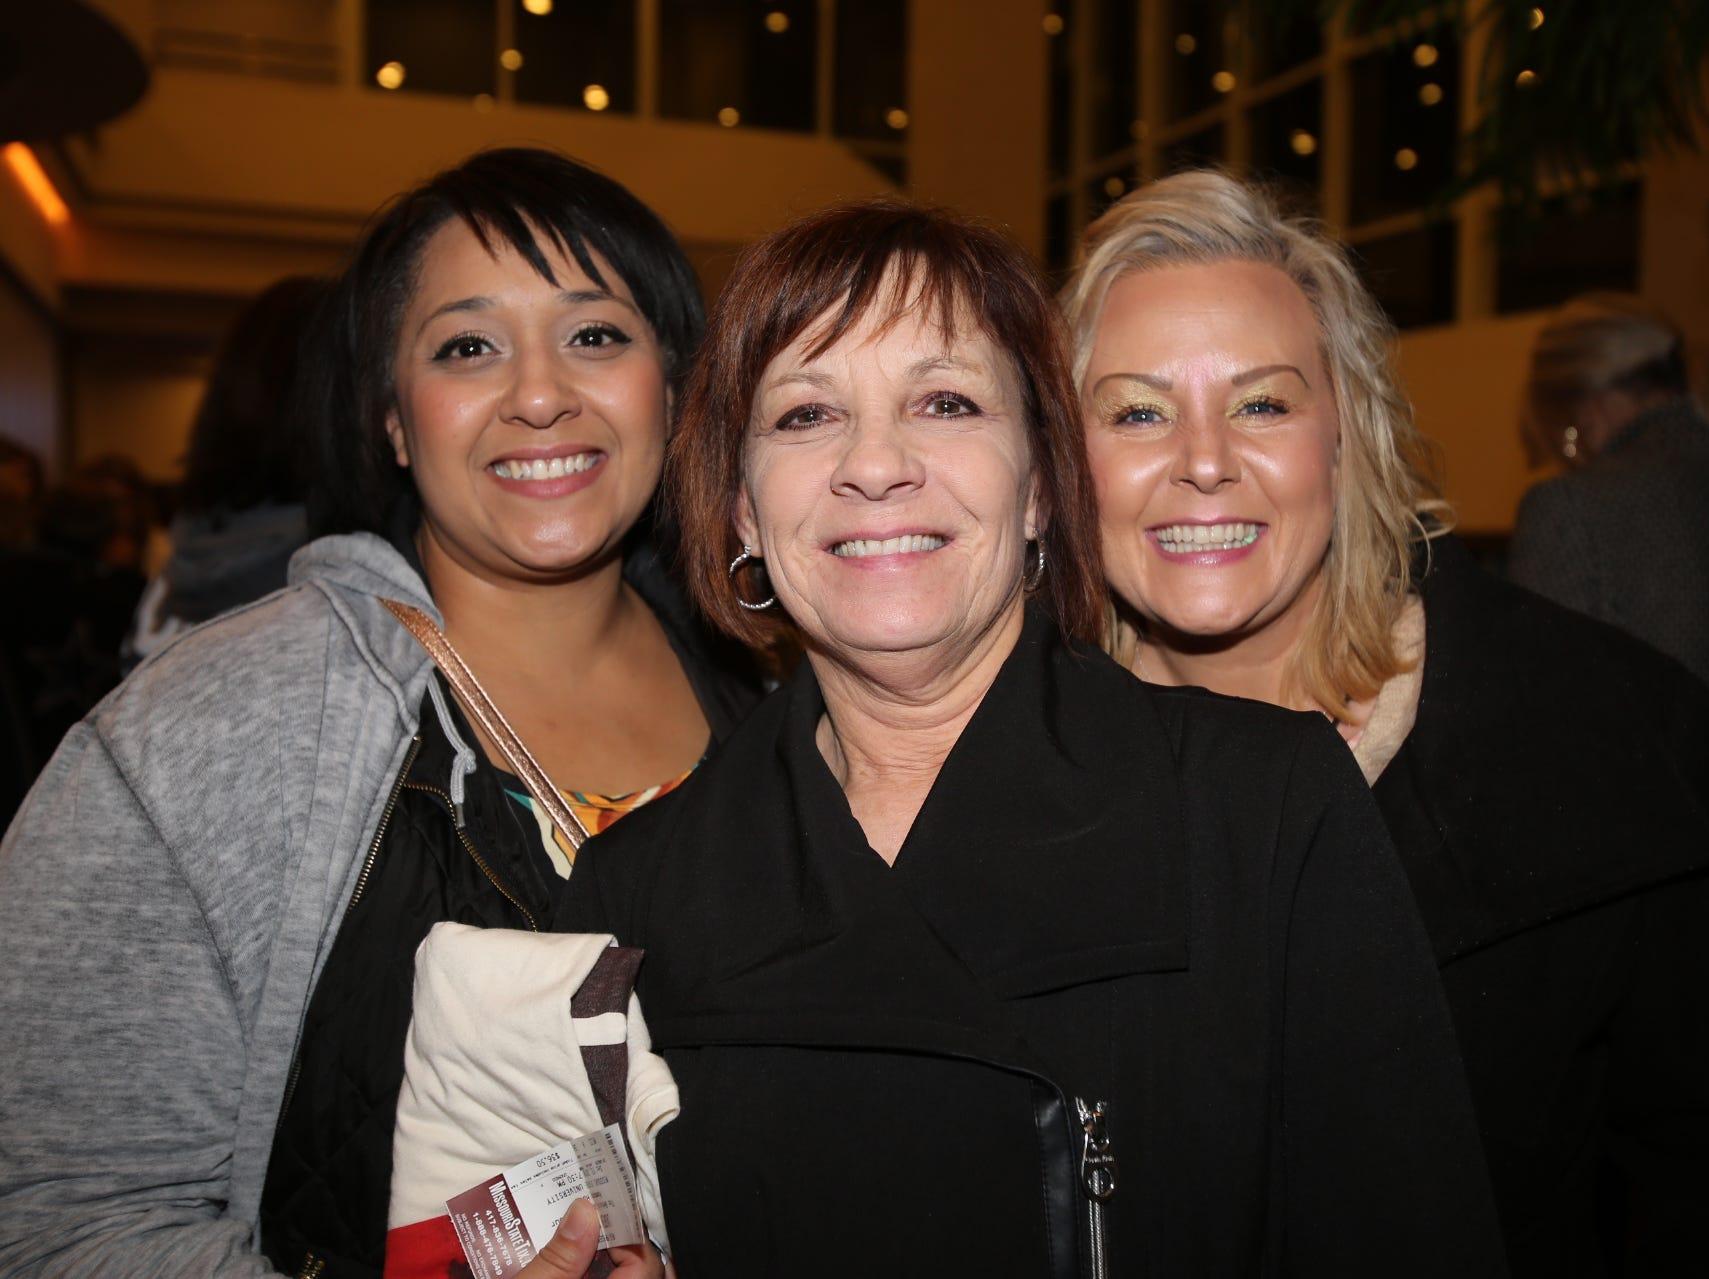 Morrisa and Vicki Whitworth and Jessica Cook